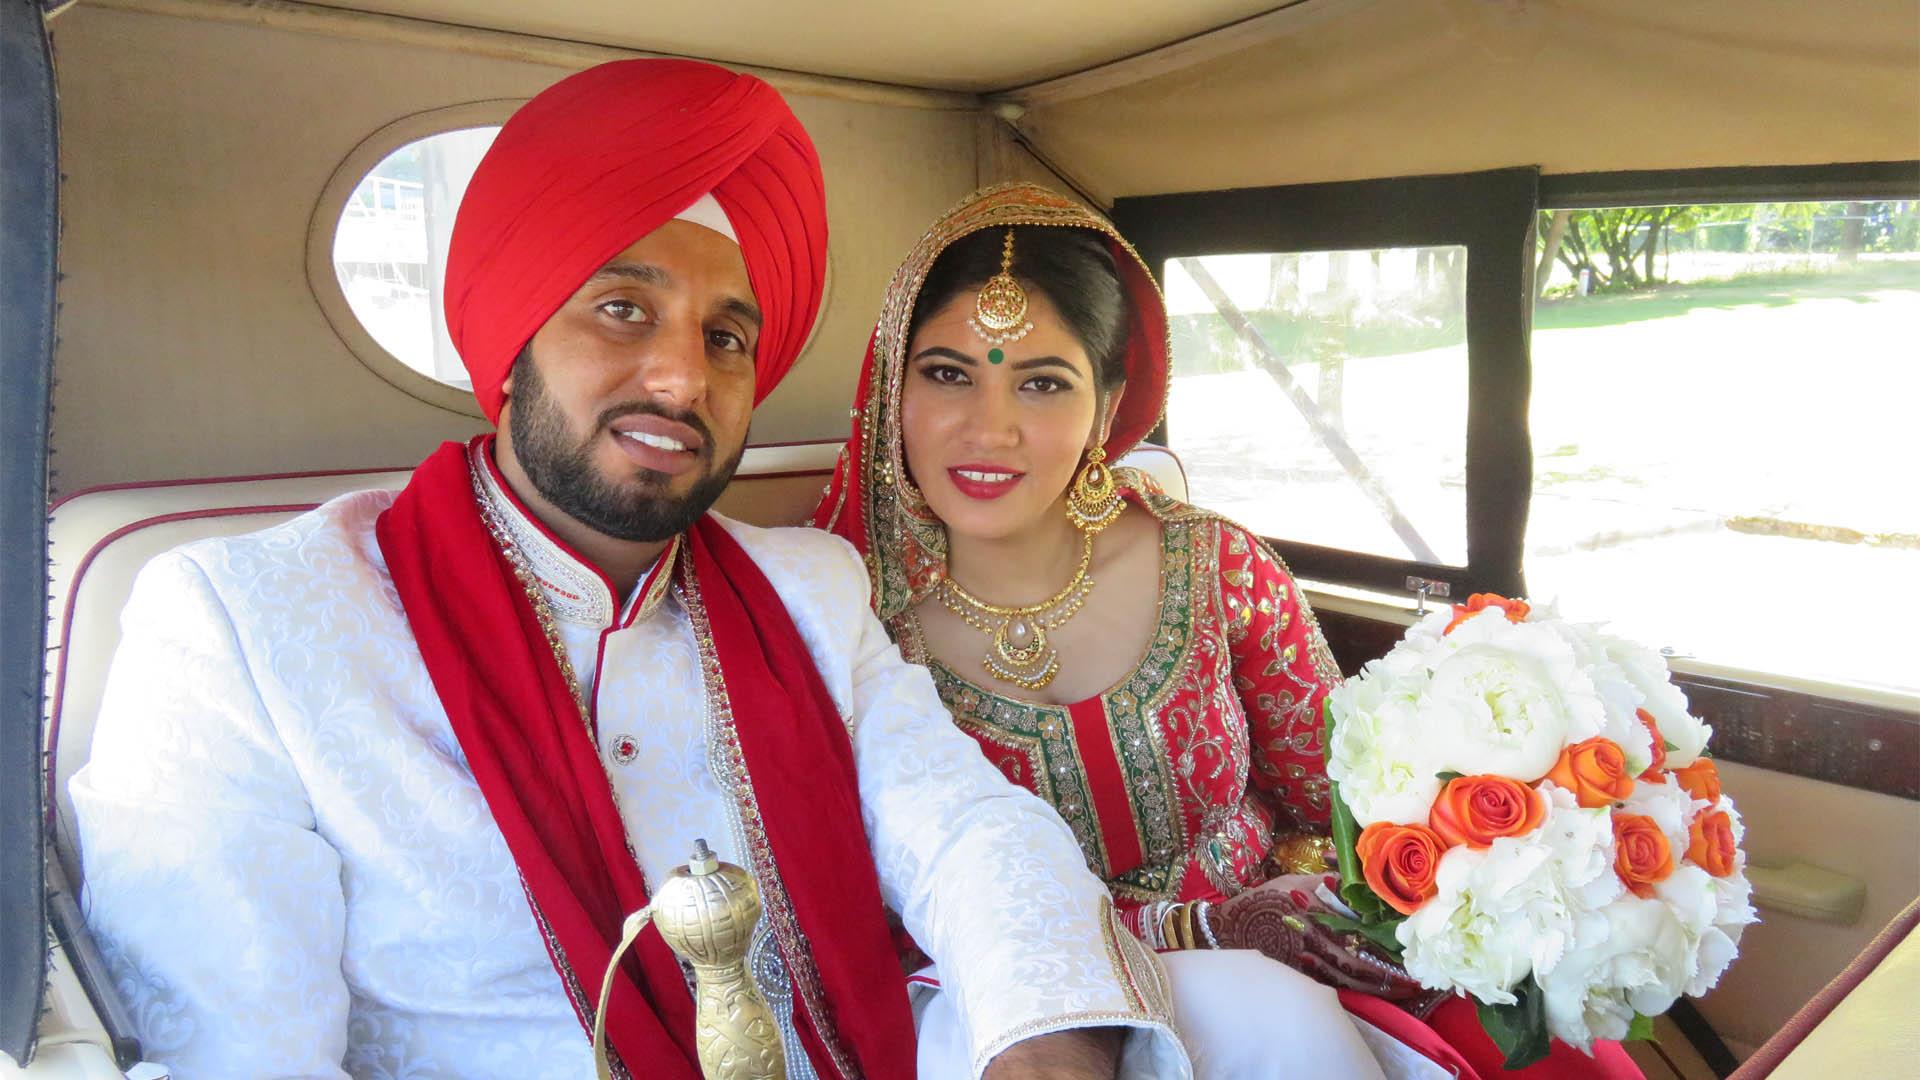 vintage-wedding-car-rental-vancouver-bride-groom-1